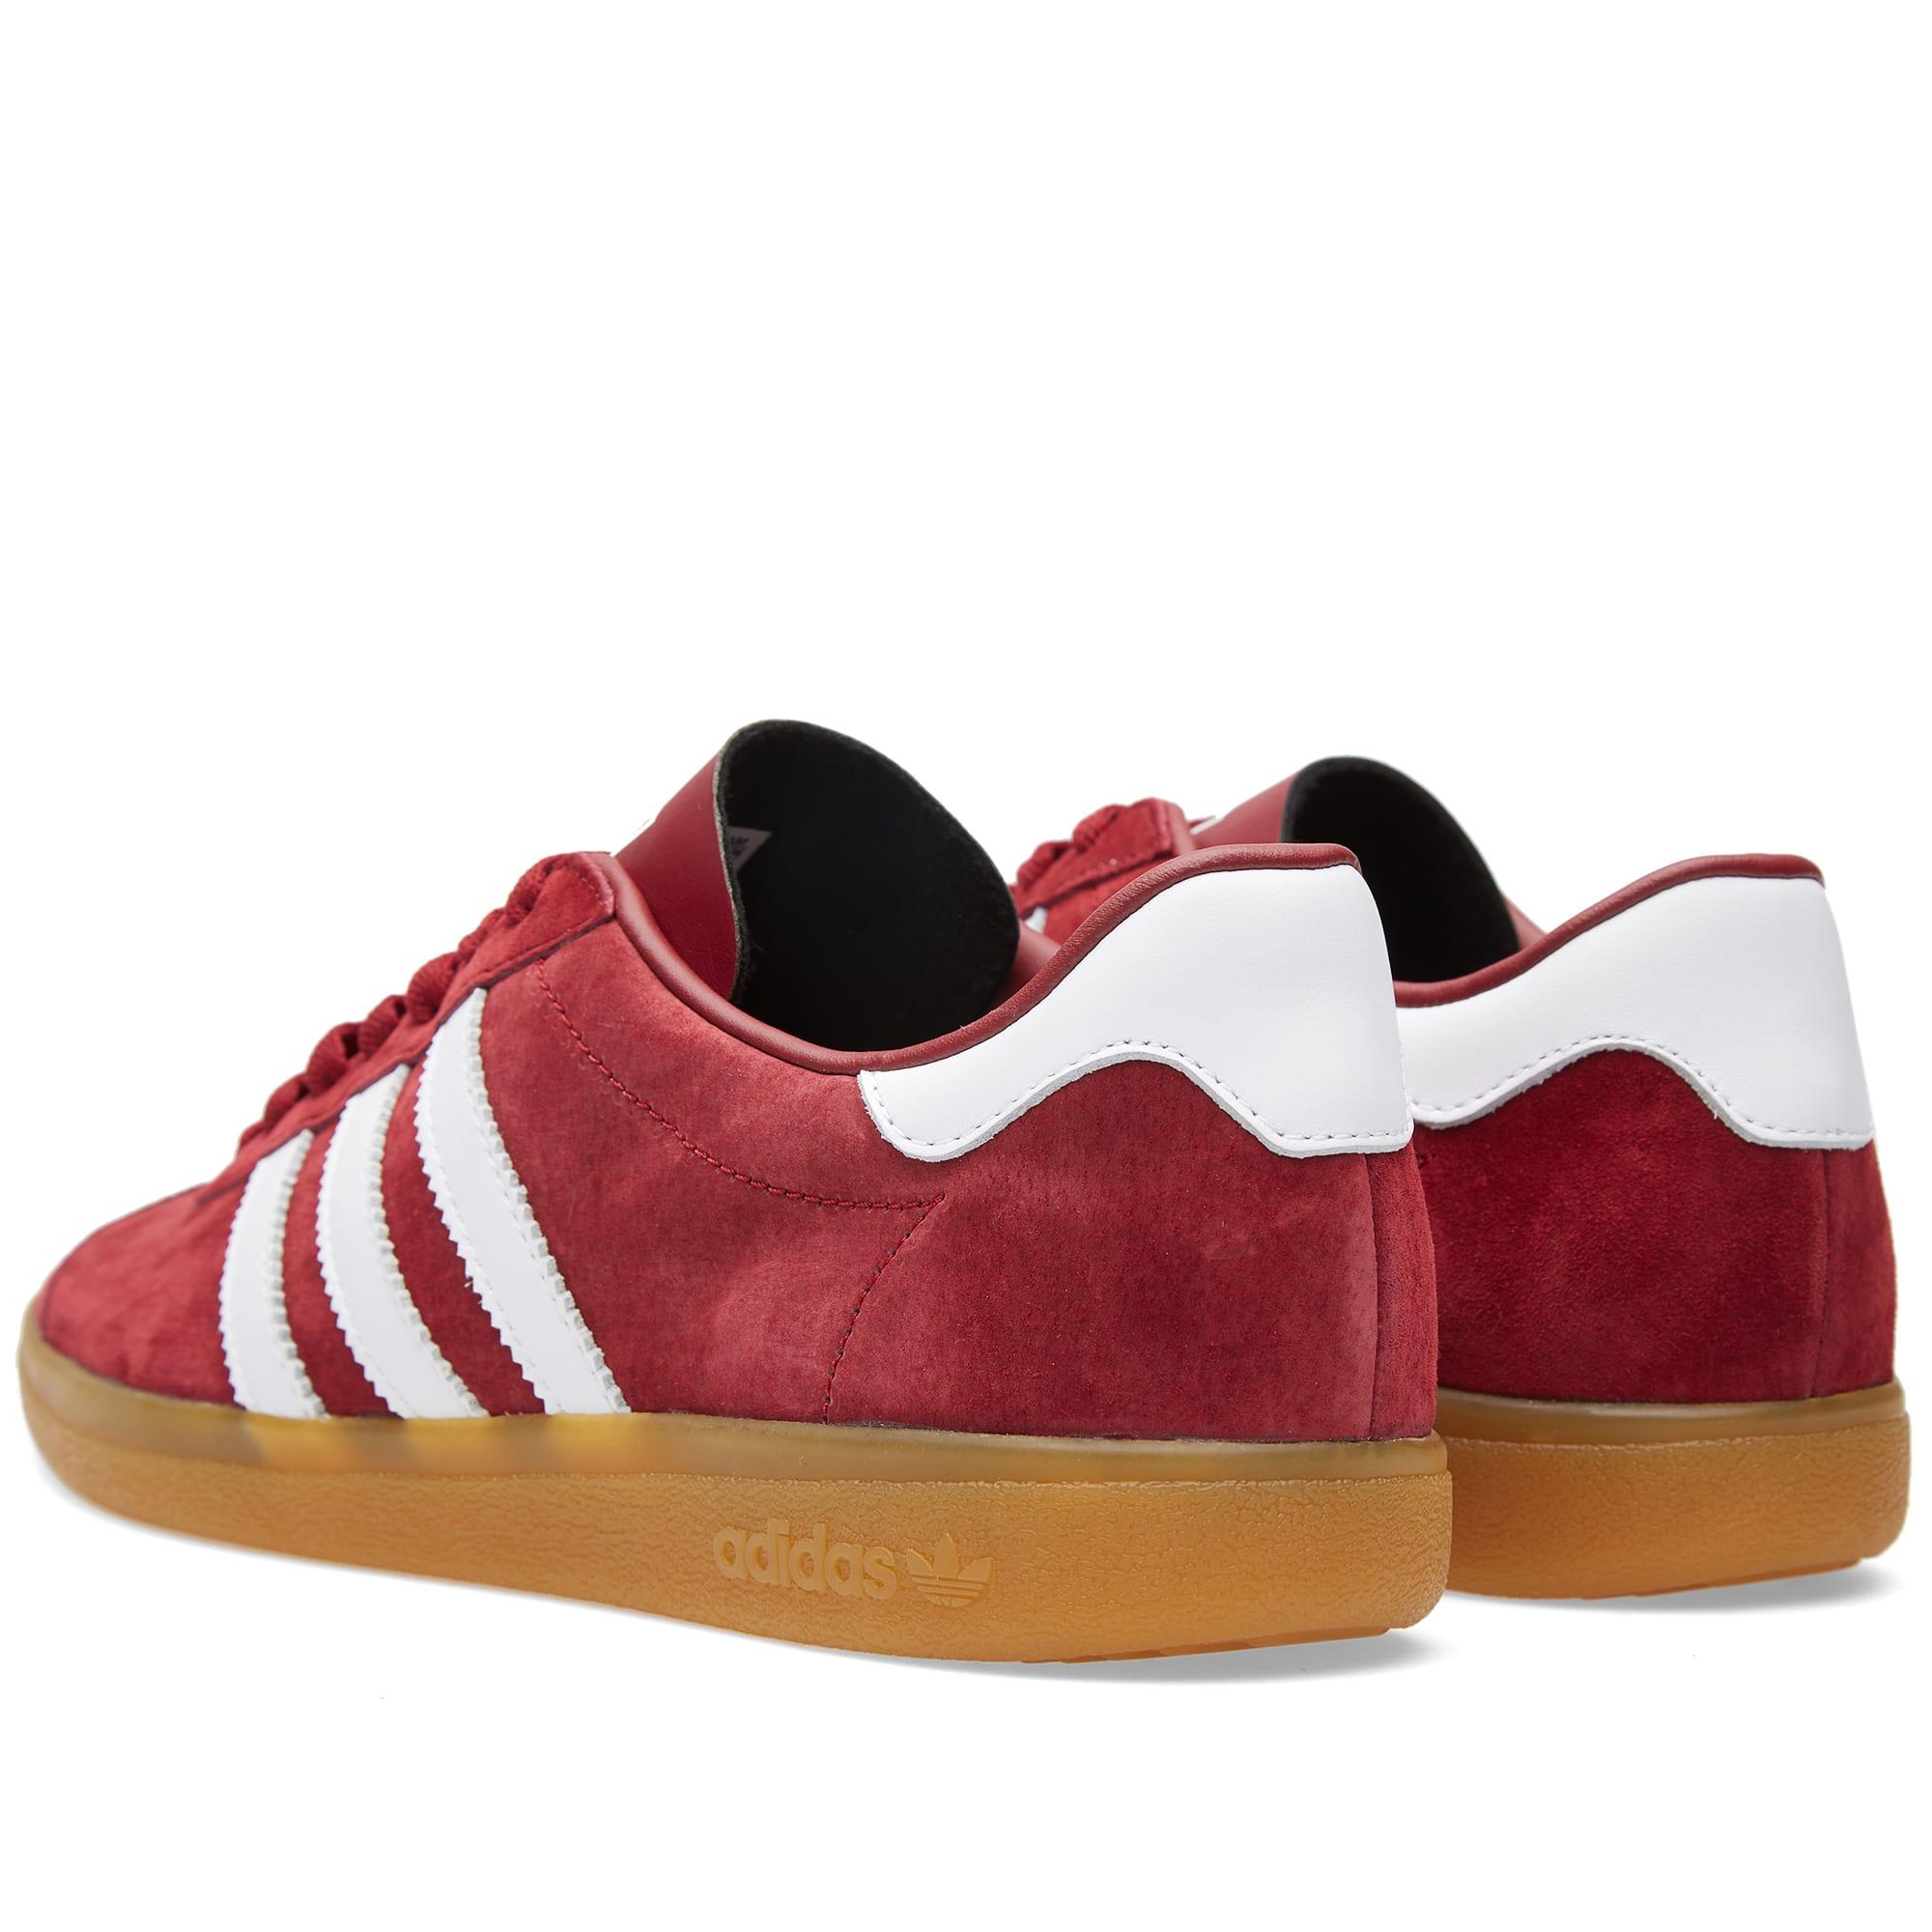 Adidas Samoa Dark Red, White \u0026 Gum | END.